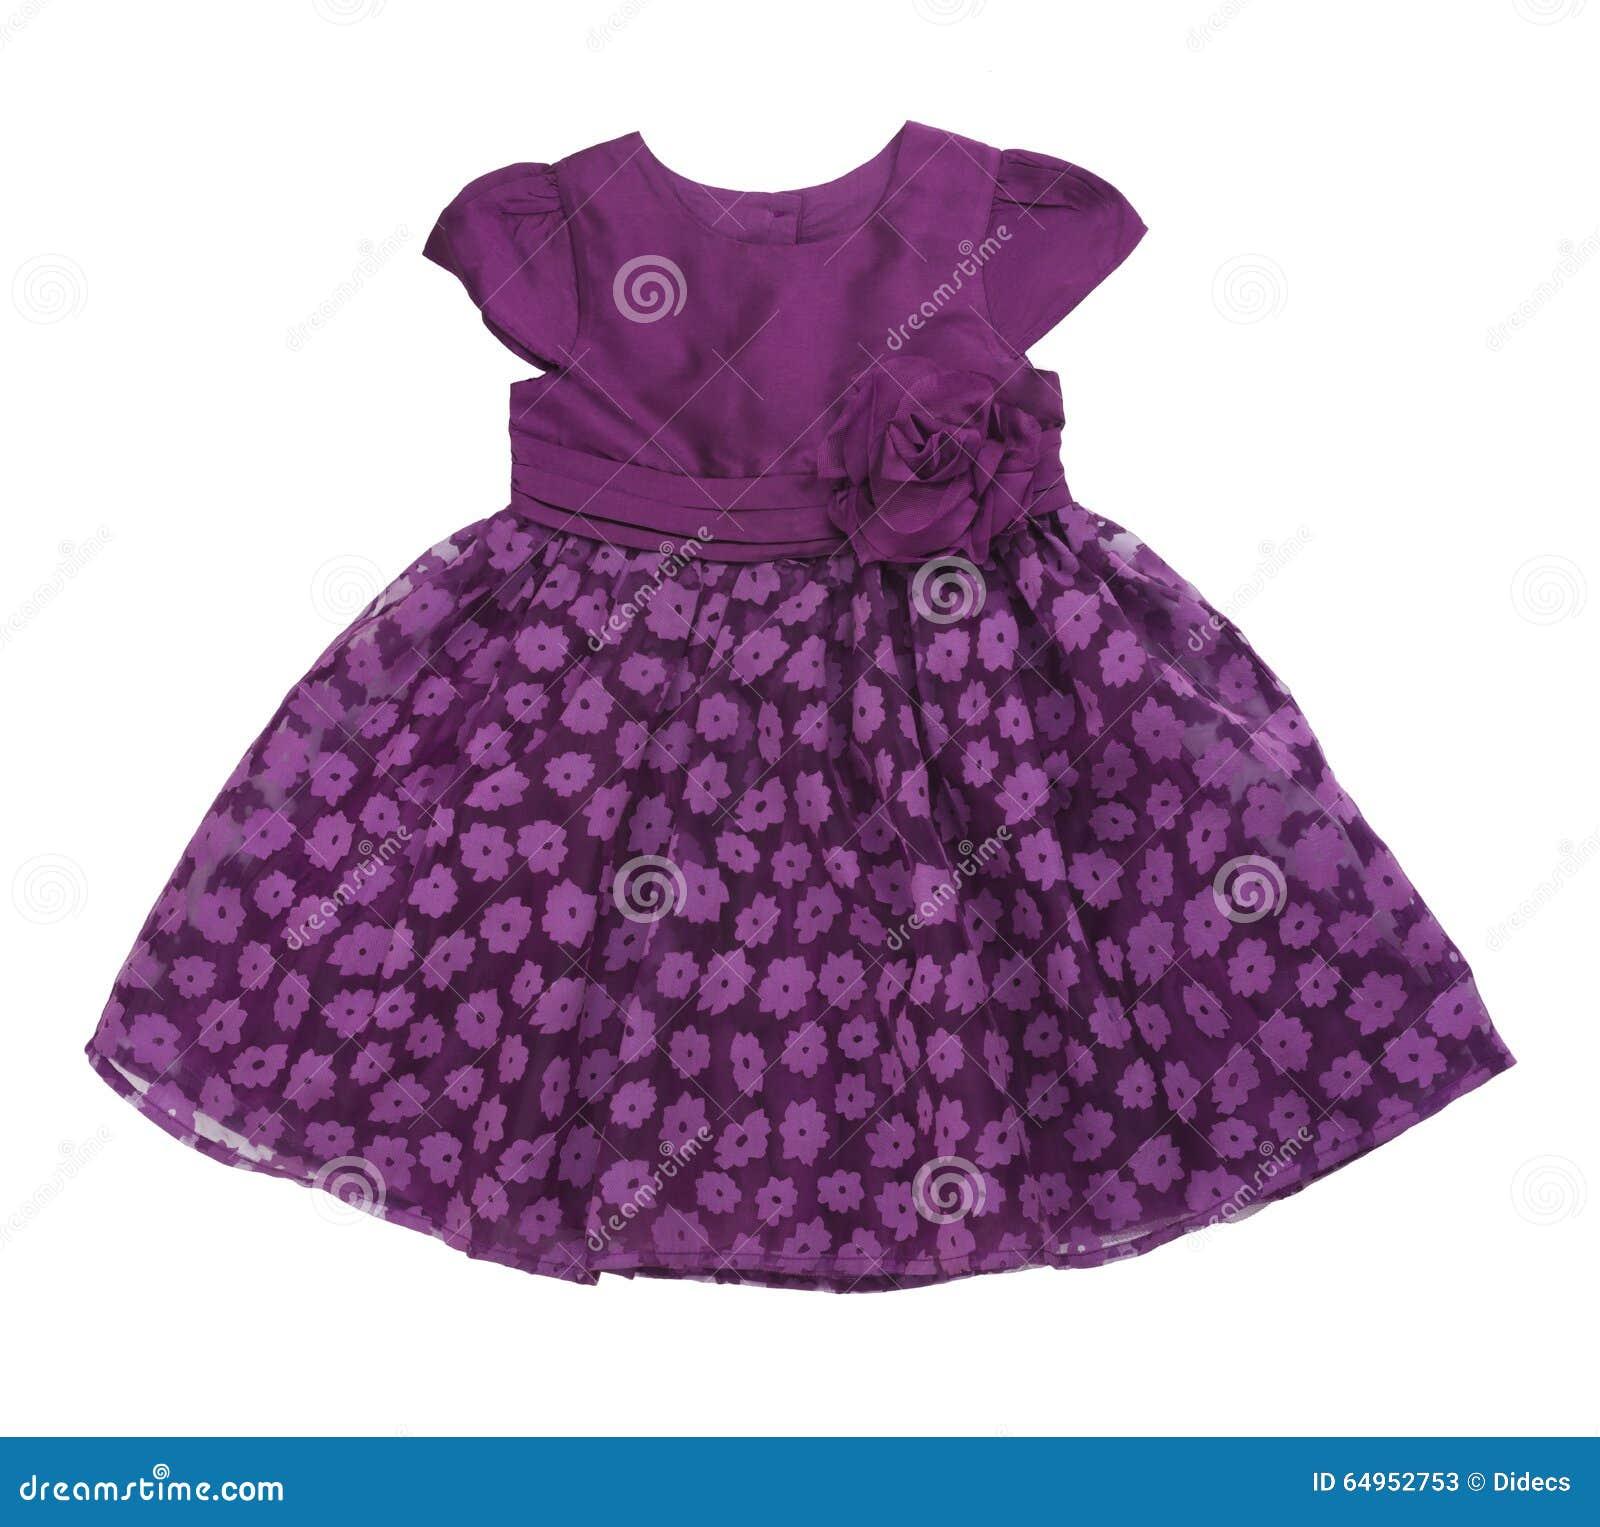 c24c10ddf7d0 Purple Baby Dress On White Background Stock Image - Image of dress ...